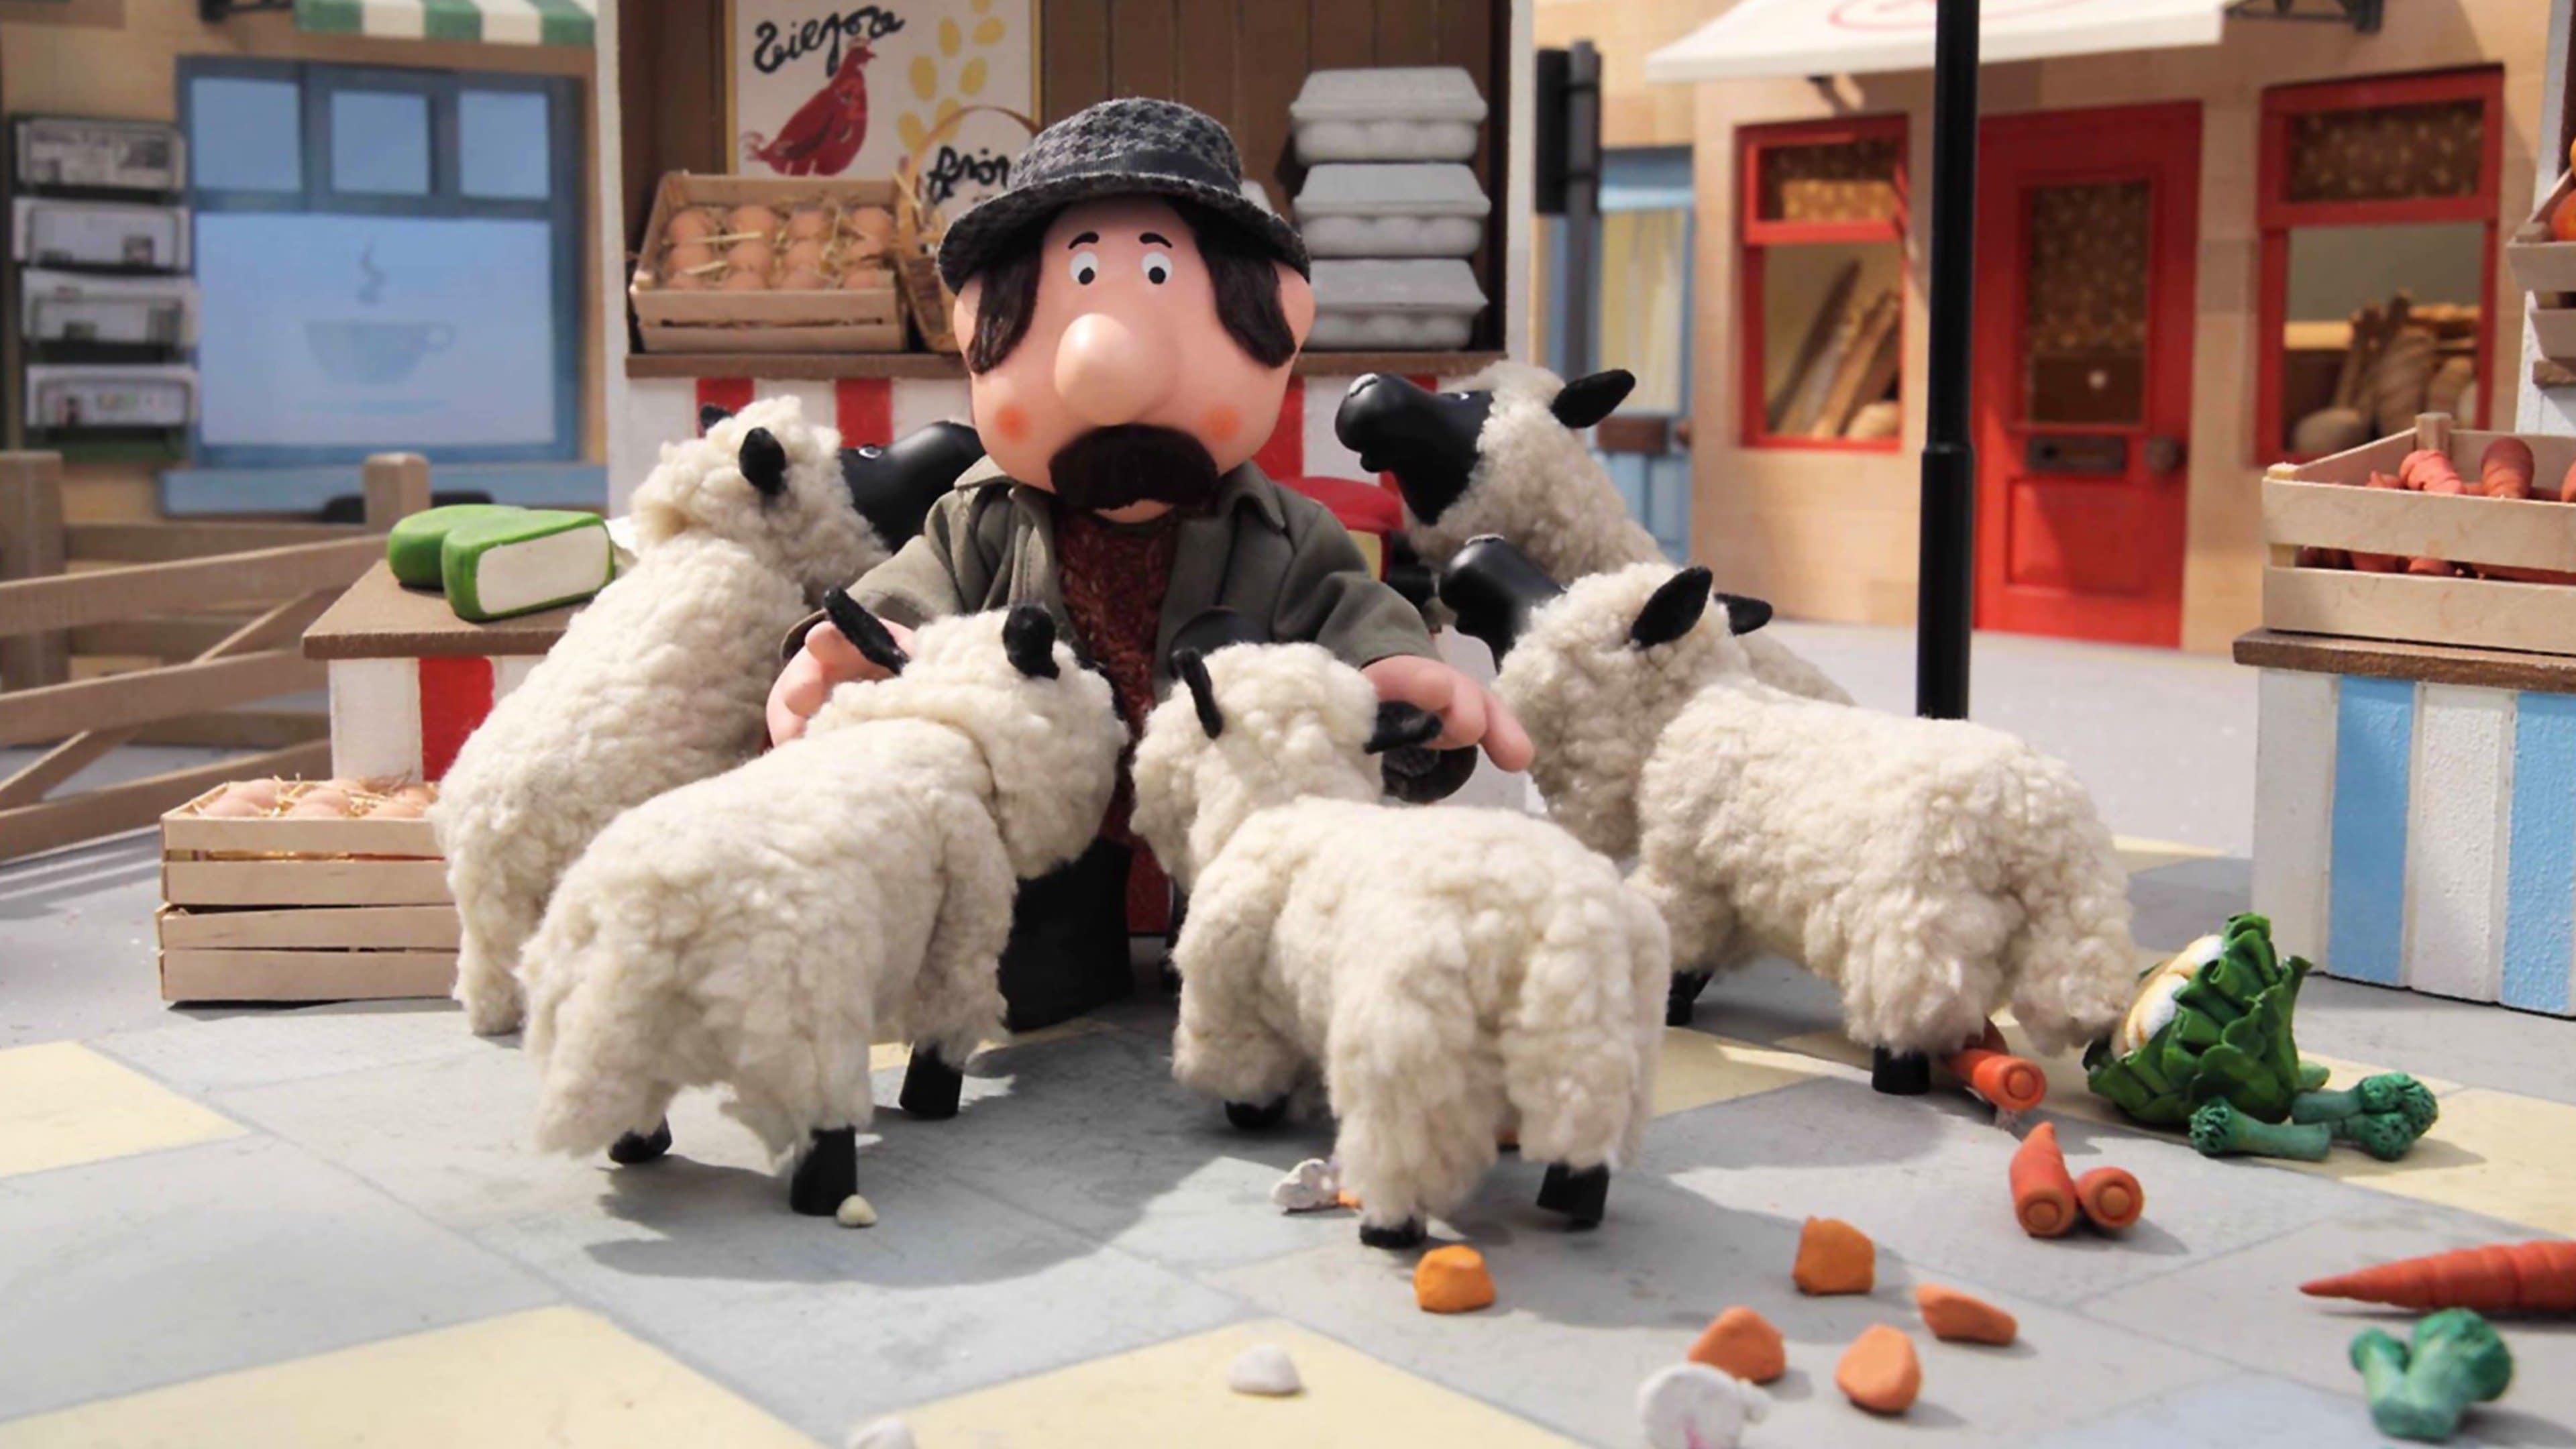 Postman Pat and the Cheeky Sheep